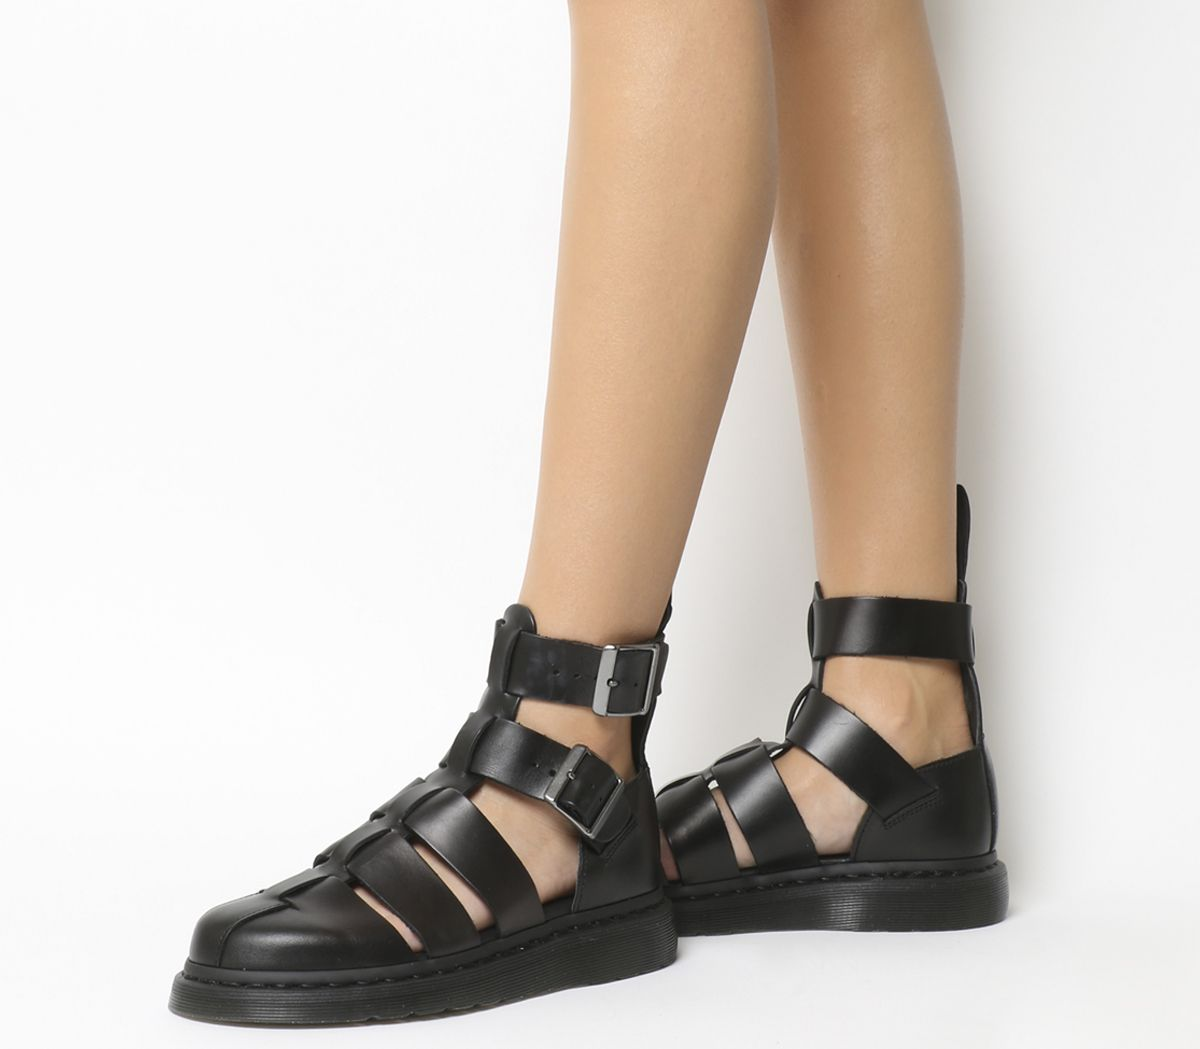 1472c4fab6f Dr. Martens Geraldo Sandal Black Brando Leather - Sandals